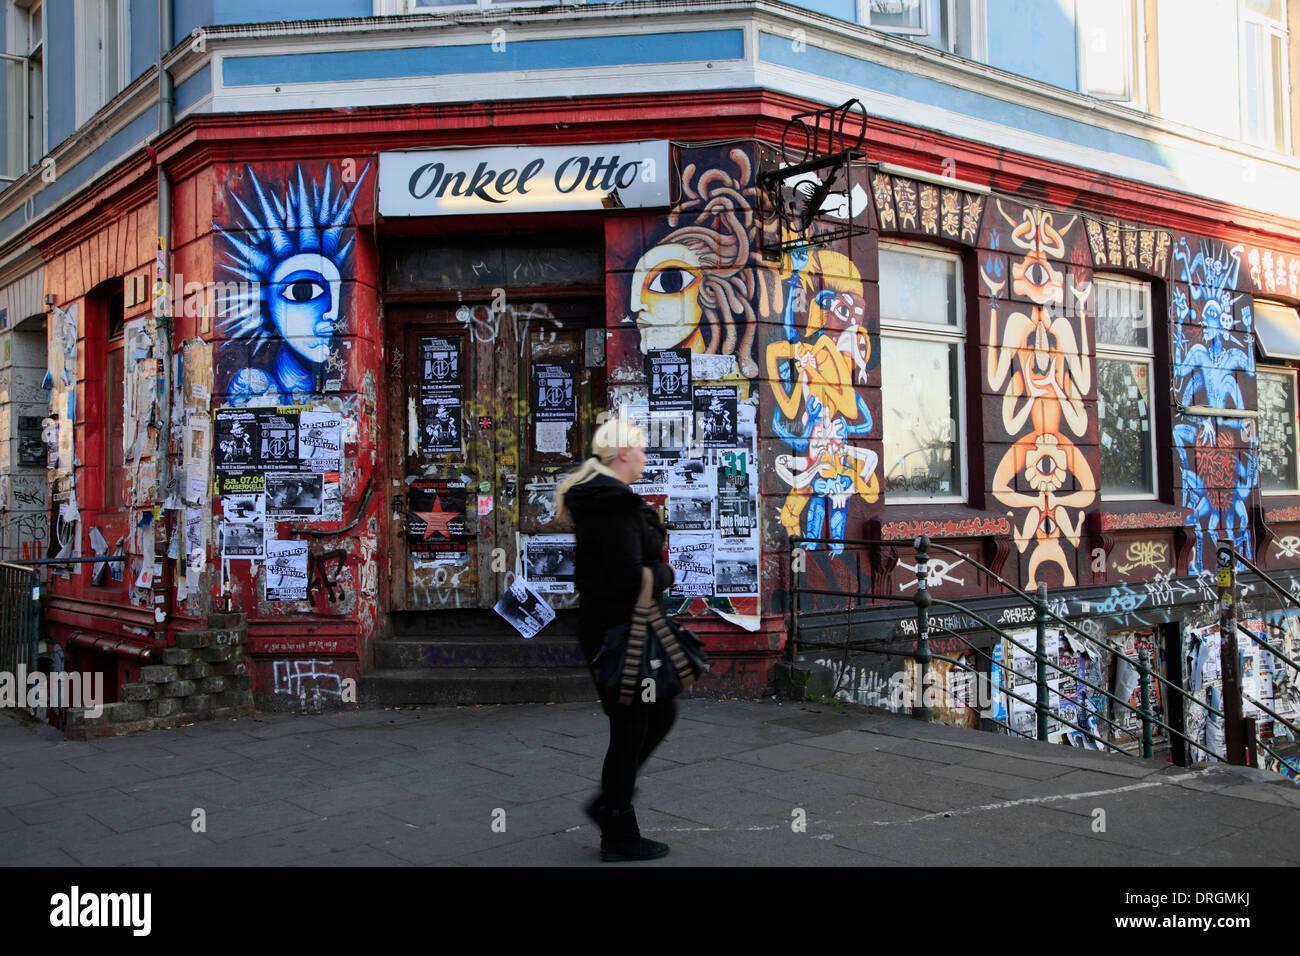 Germany Hamburg St Pauli Bar Stock Photos & Germany Hamburg St Pauli ...